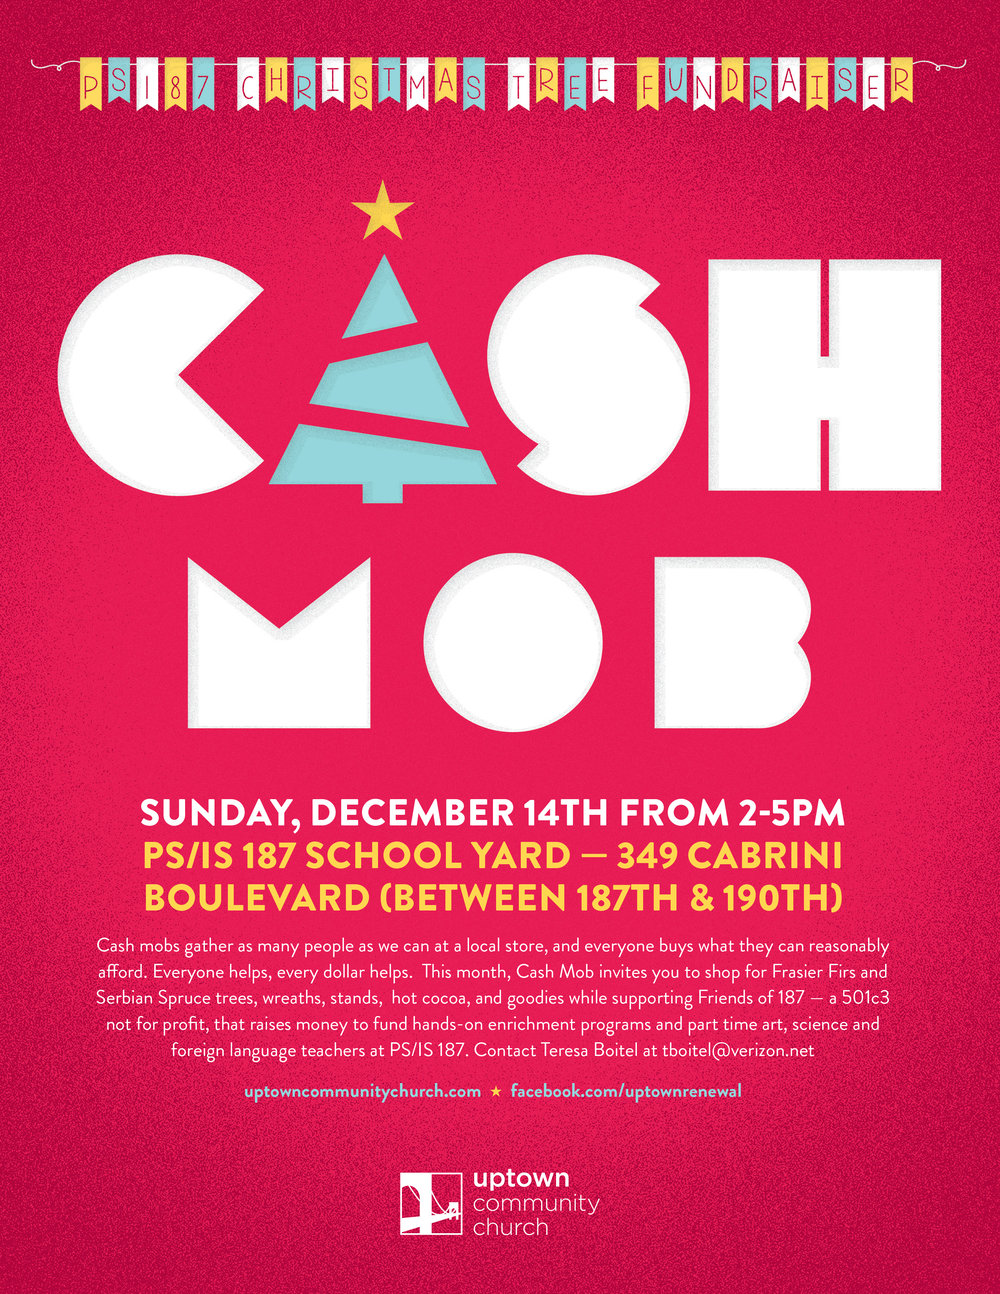 2014_Uptown_CashMob_ChristmasTreeSale.jpg